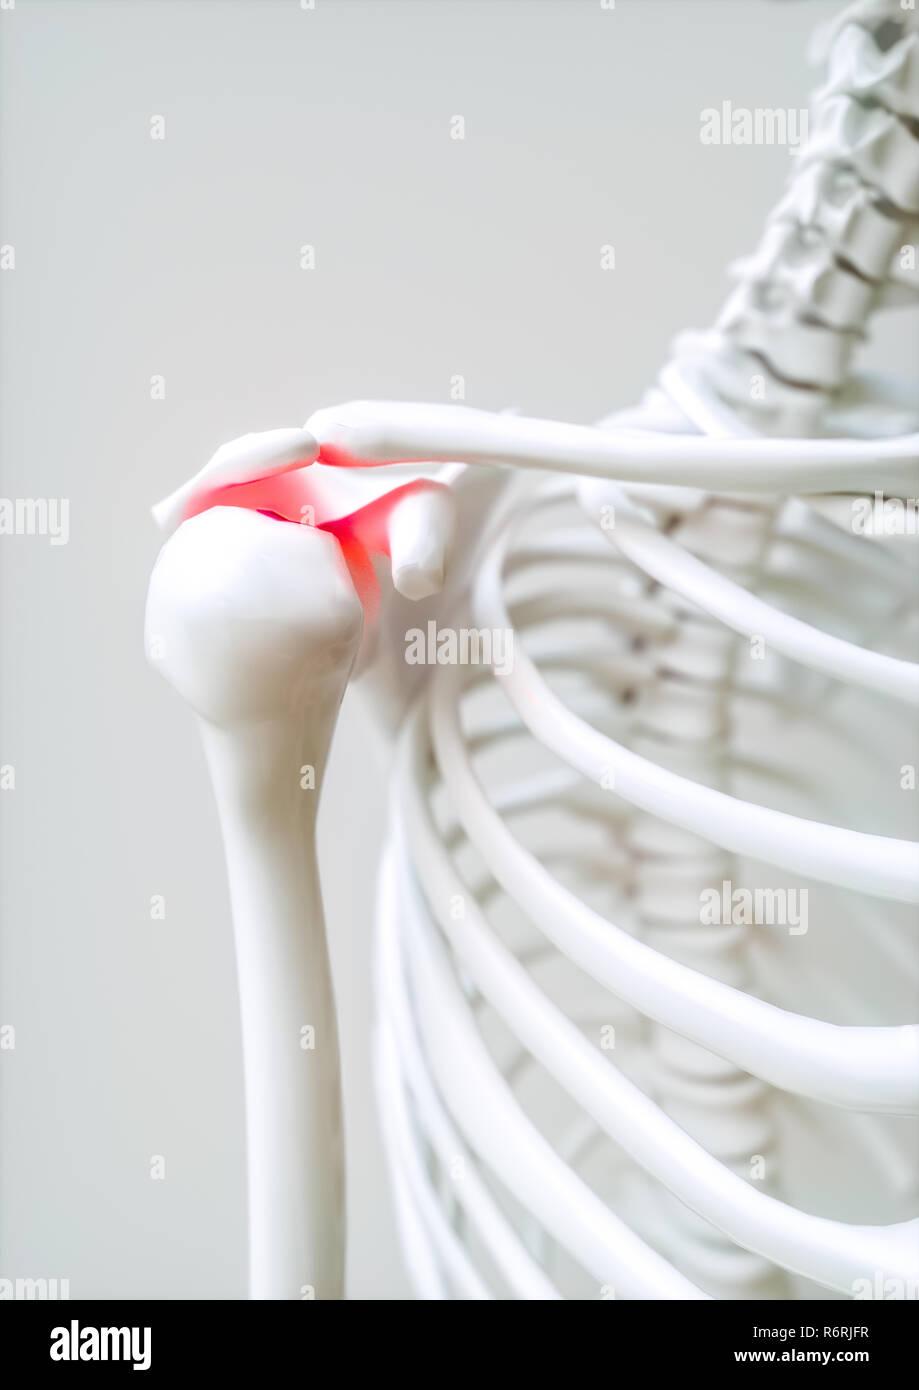 Shoulder pain - 3D Rendering - Stock Image